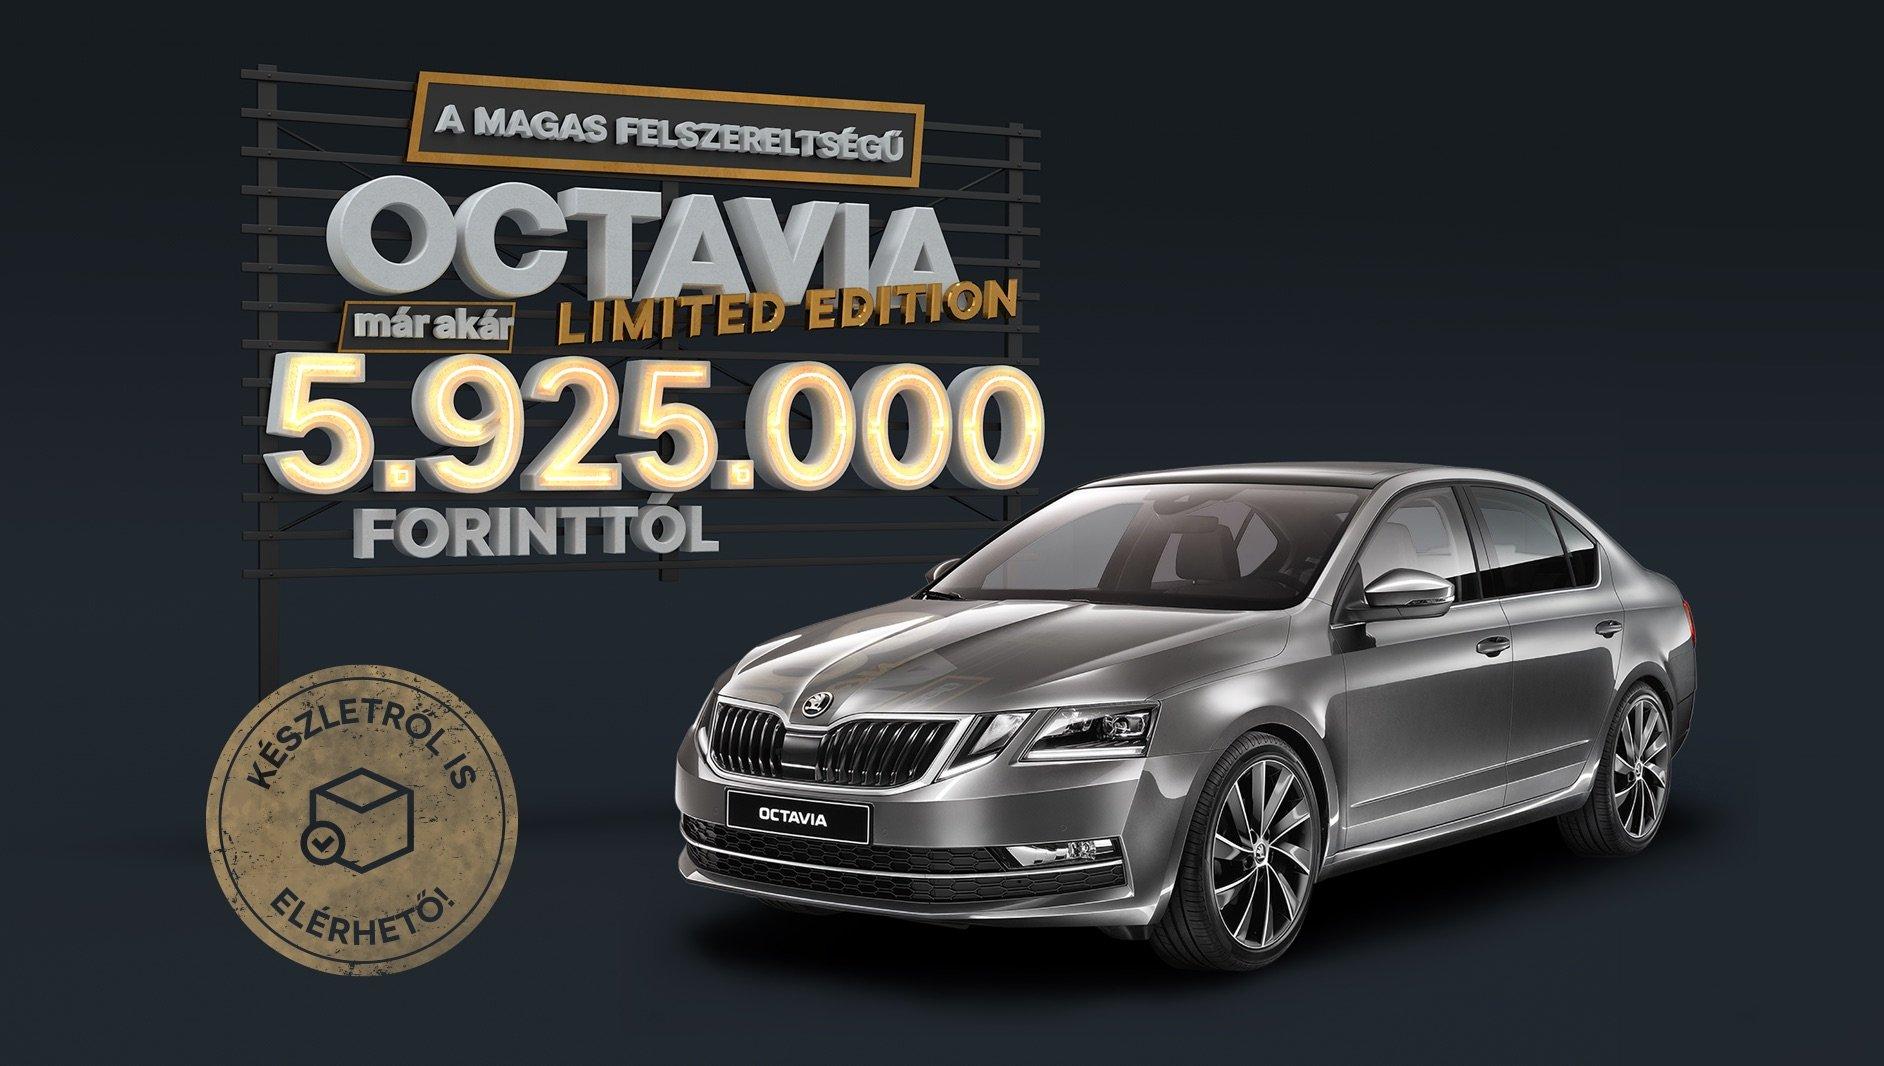 OCTAVIA Limited Edition